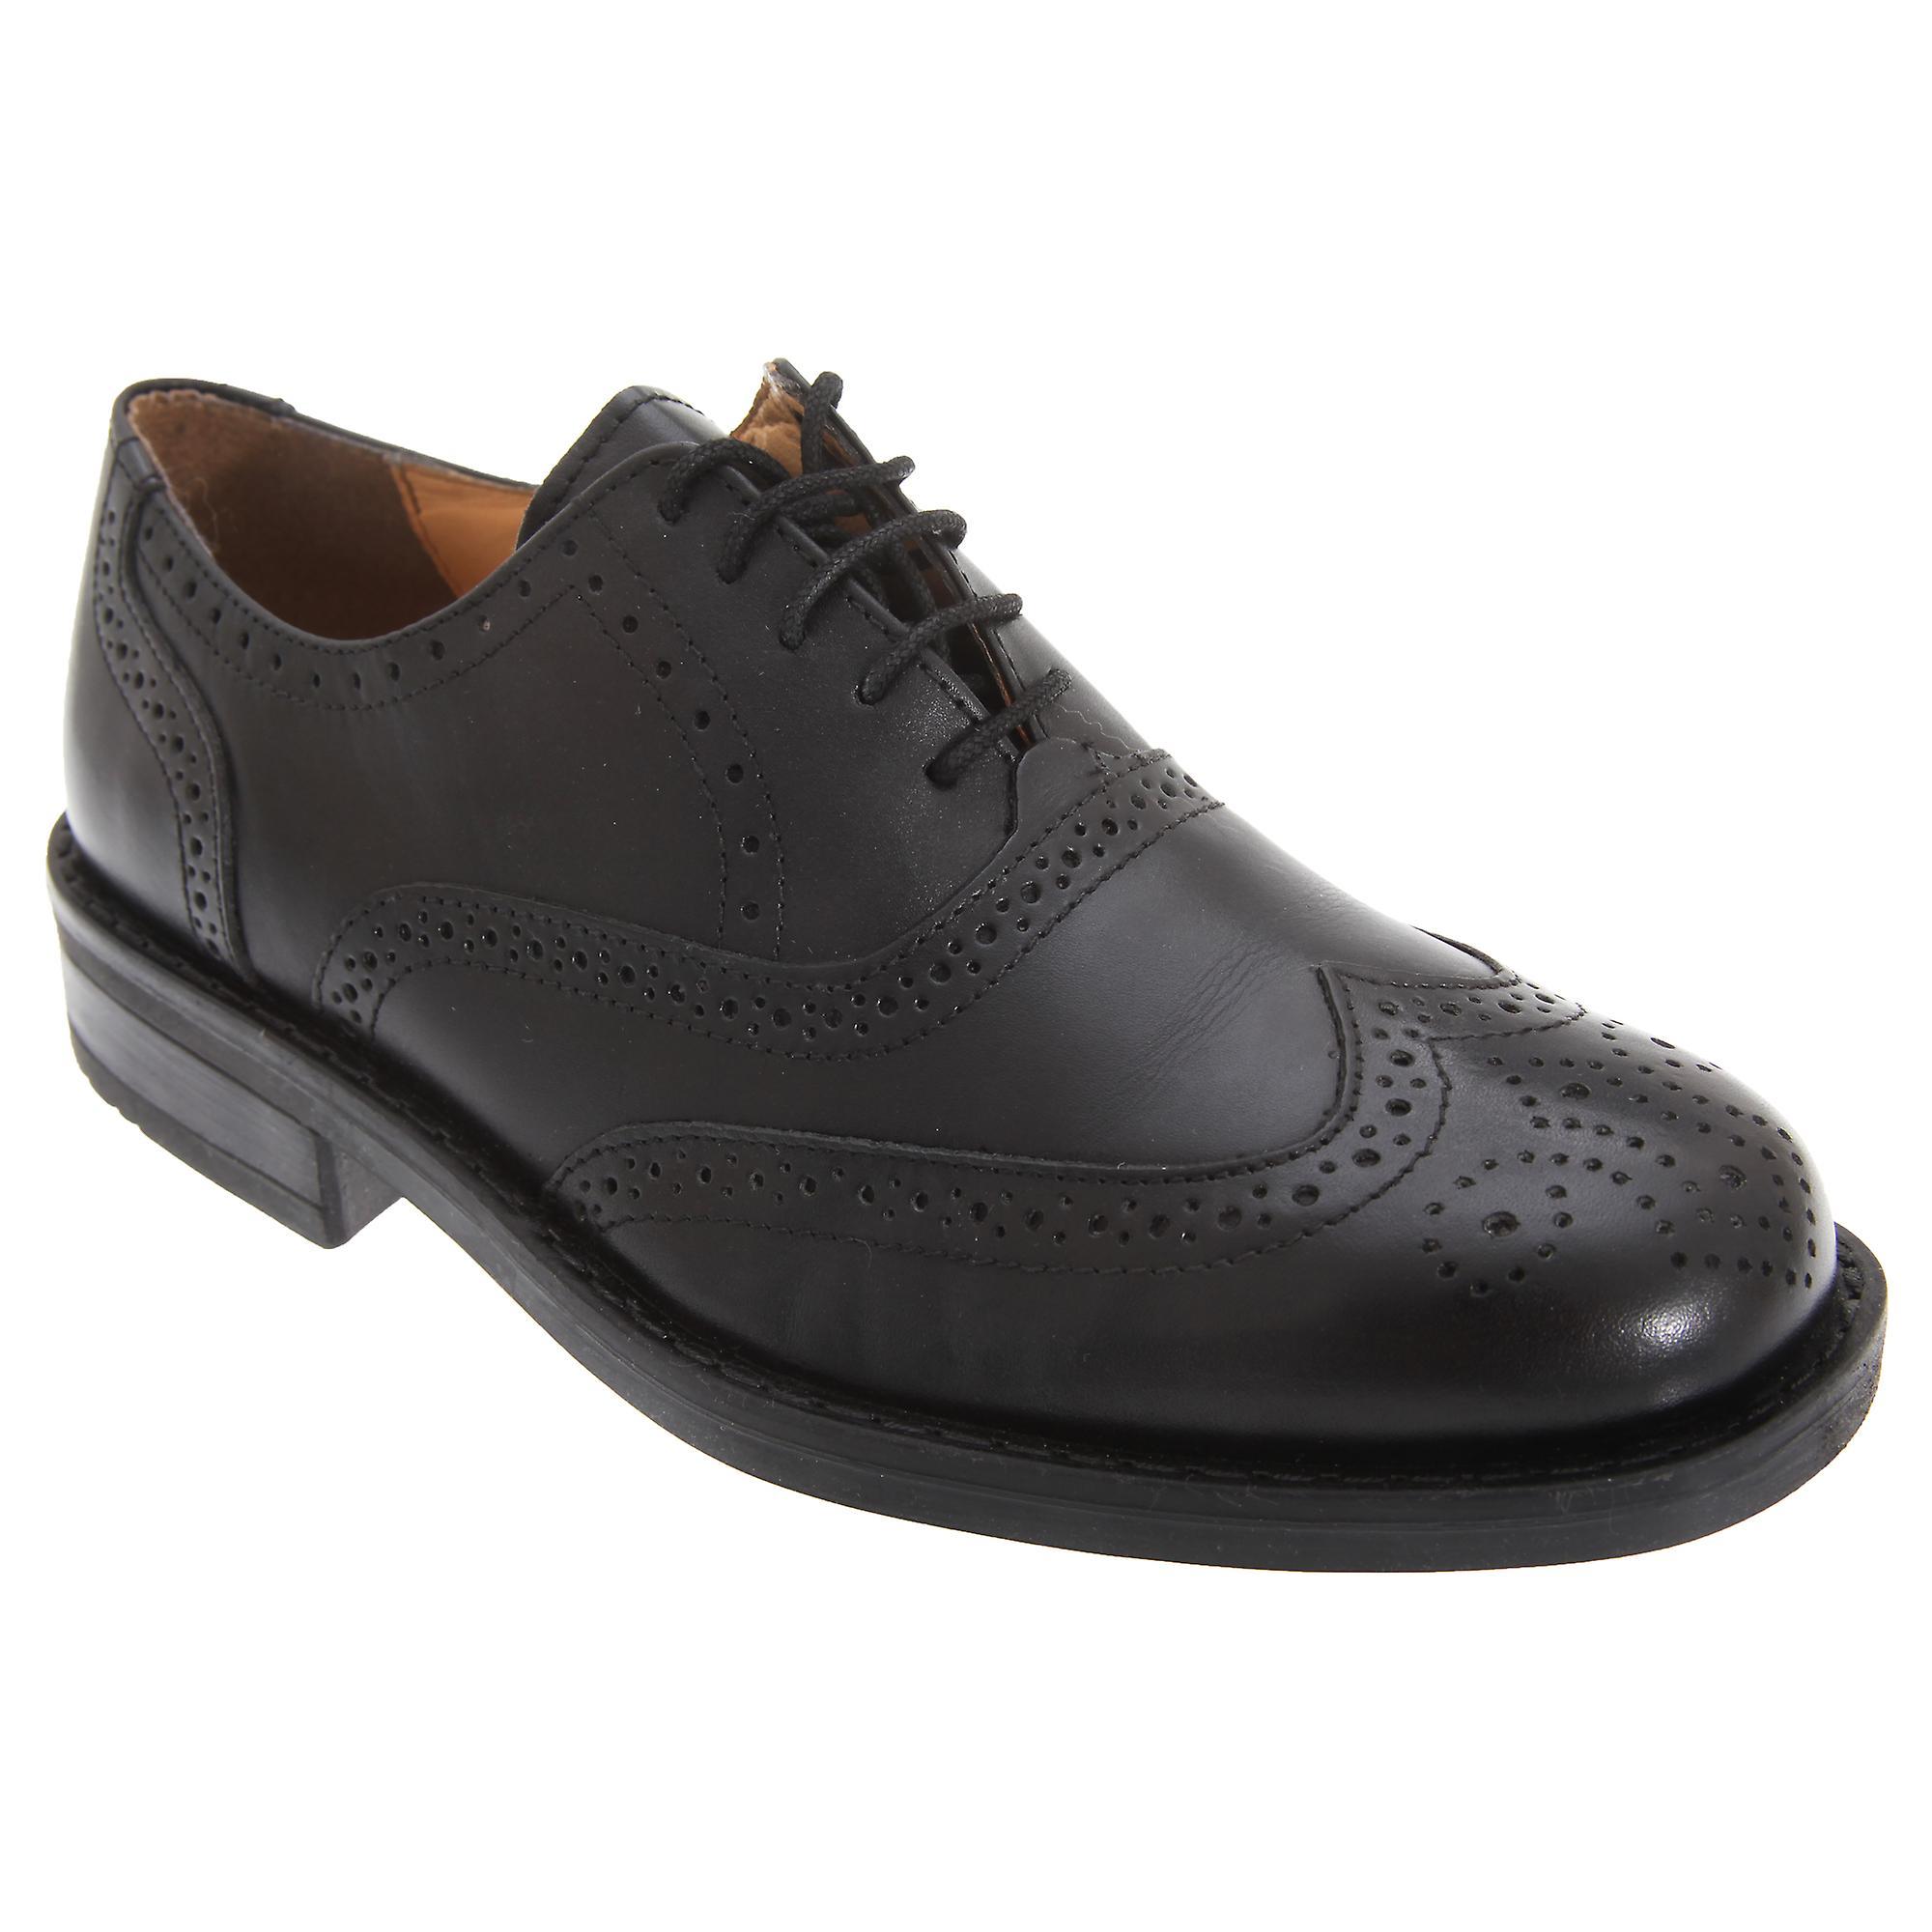 Vaganti Vaganti Vaganti mens flessi cuoio accento scarpe oxford   Prodotti di alta qualità  cb52af